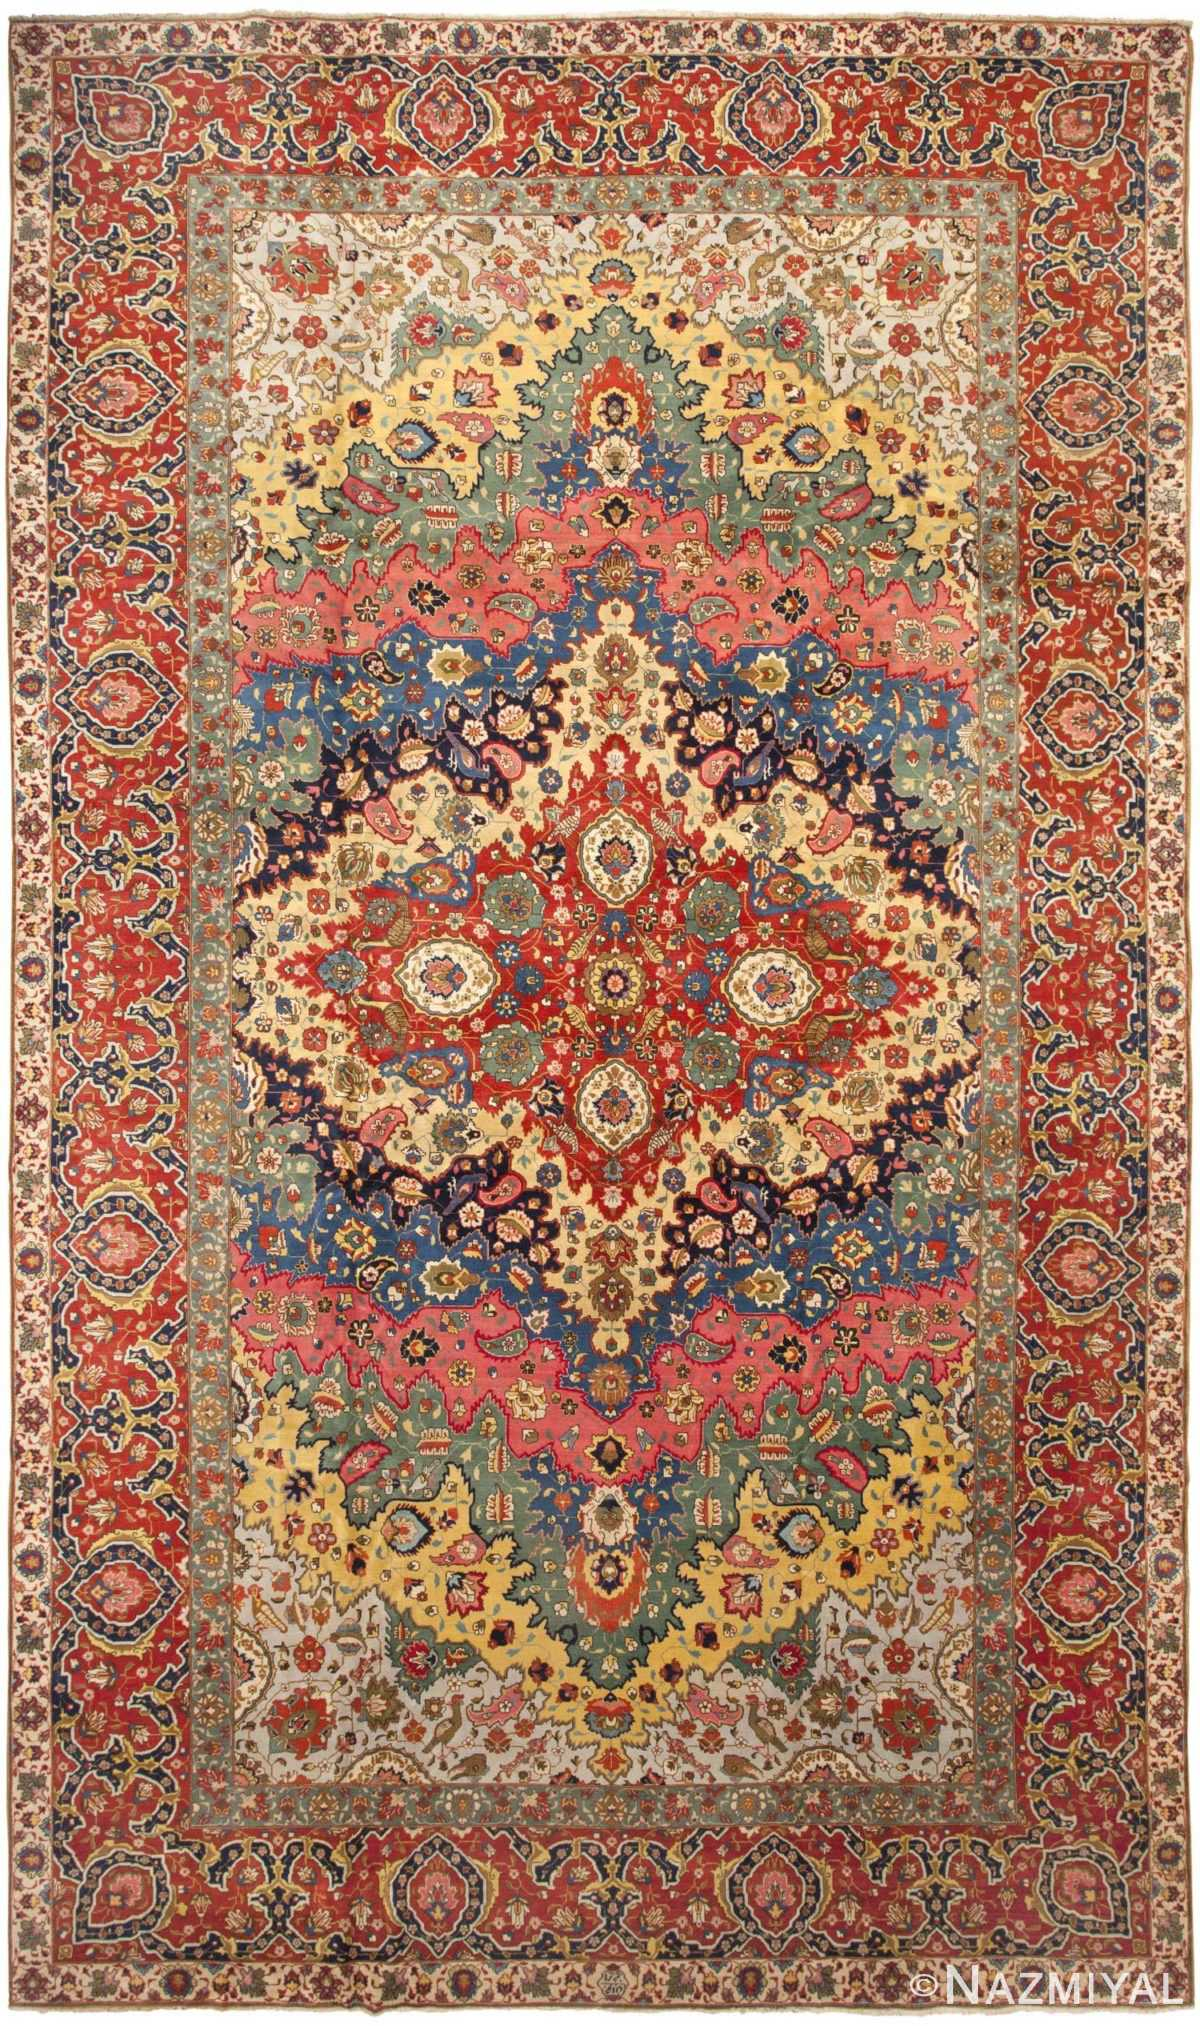 Antique Persian Tabriz Rug 46383 Detail/Large View